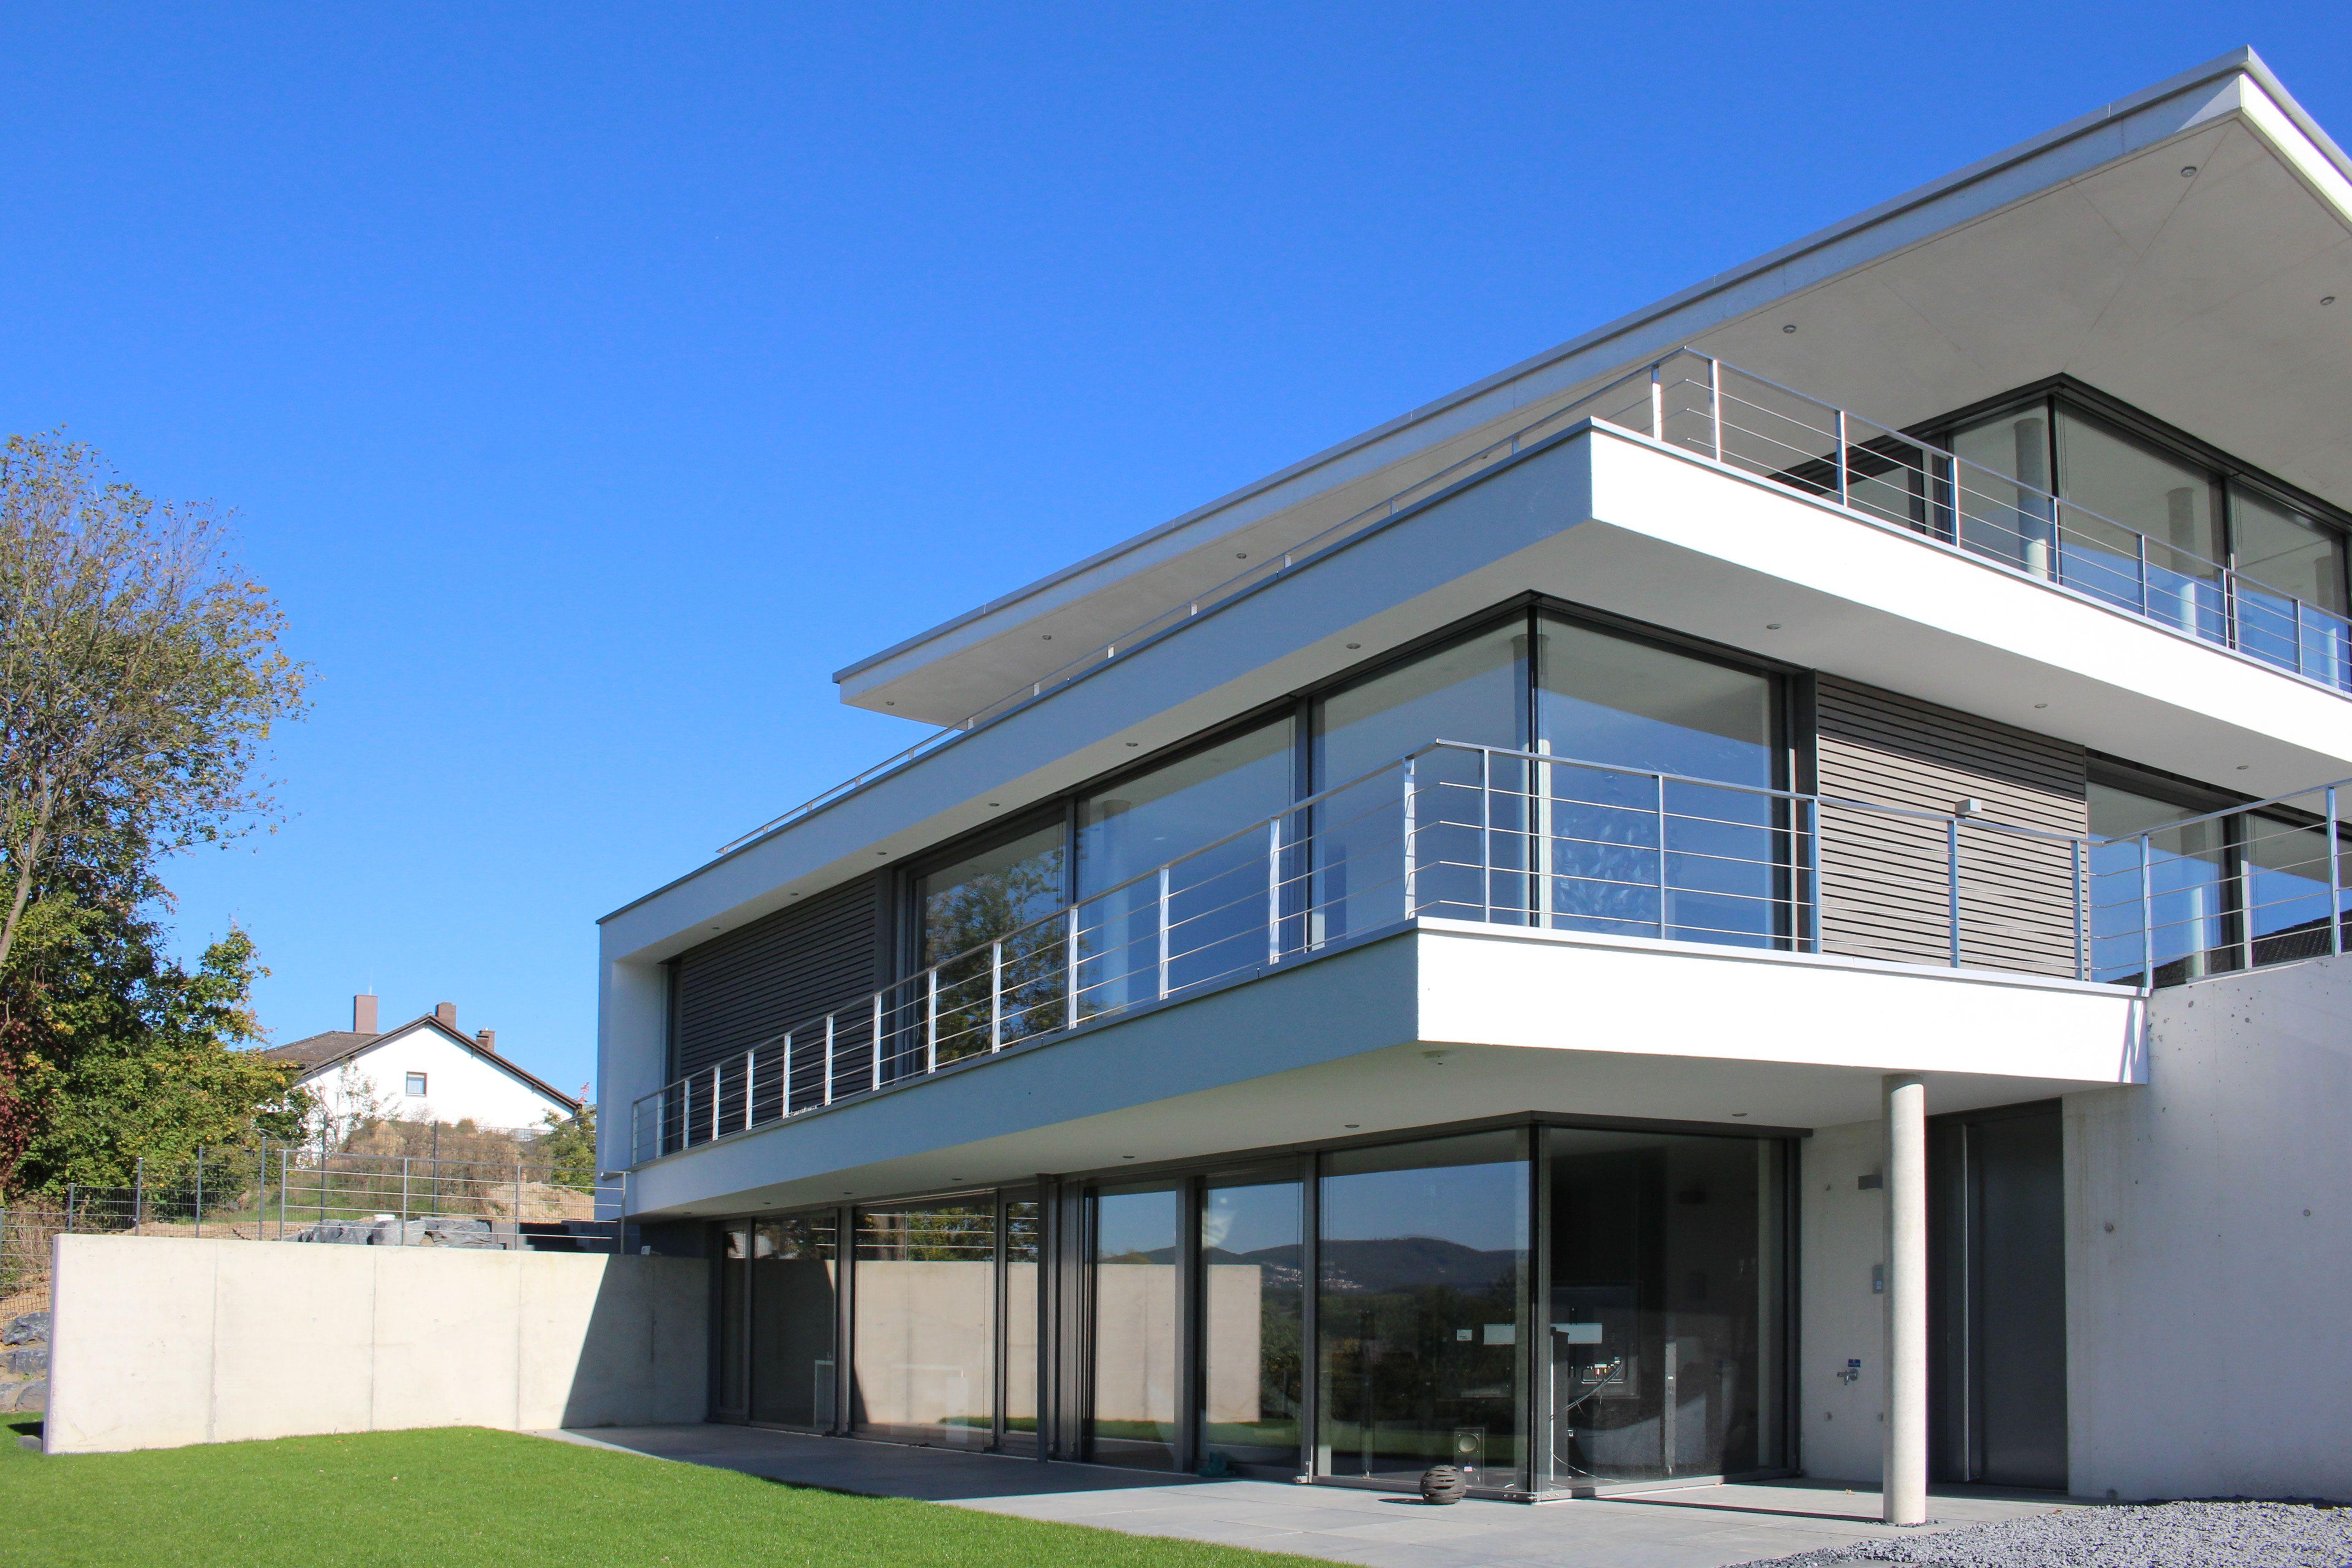 Weber Und Partner fassade weber und partner edifícios baixos